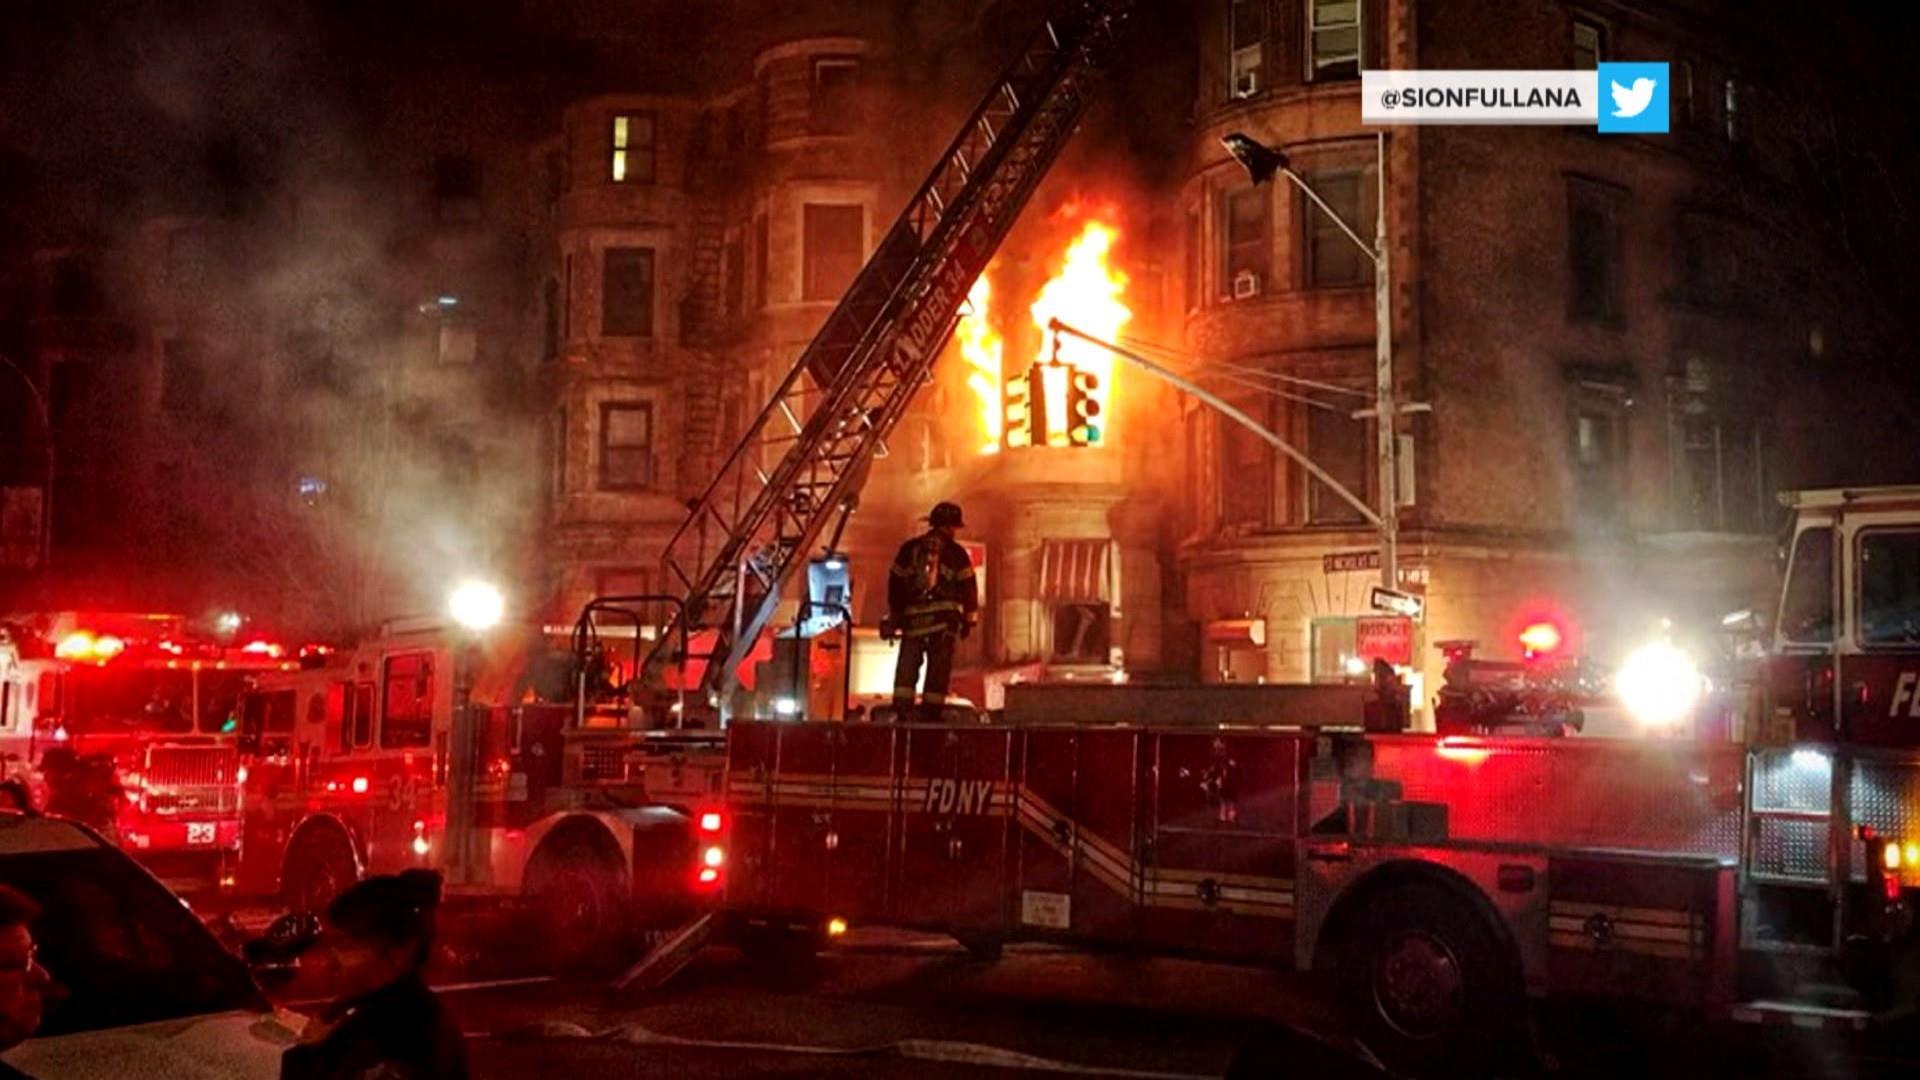 Firefighter dies in New York film set fire